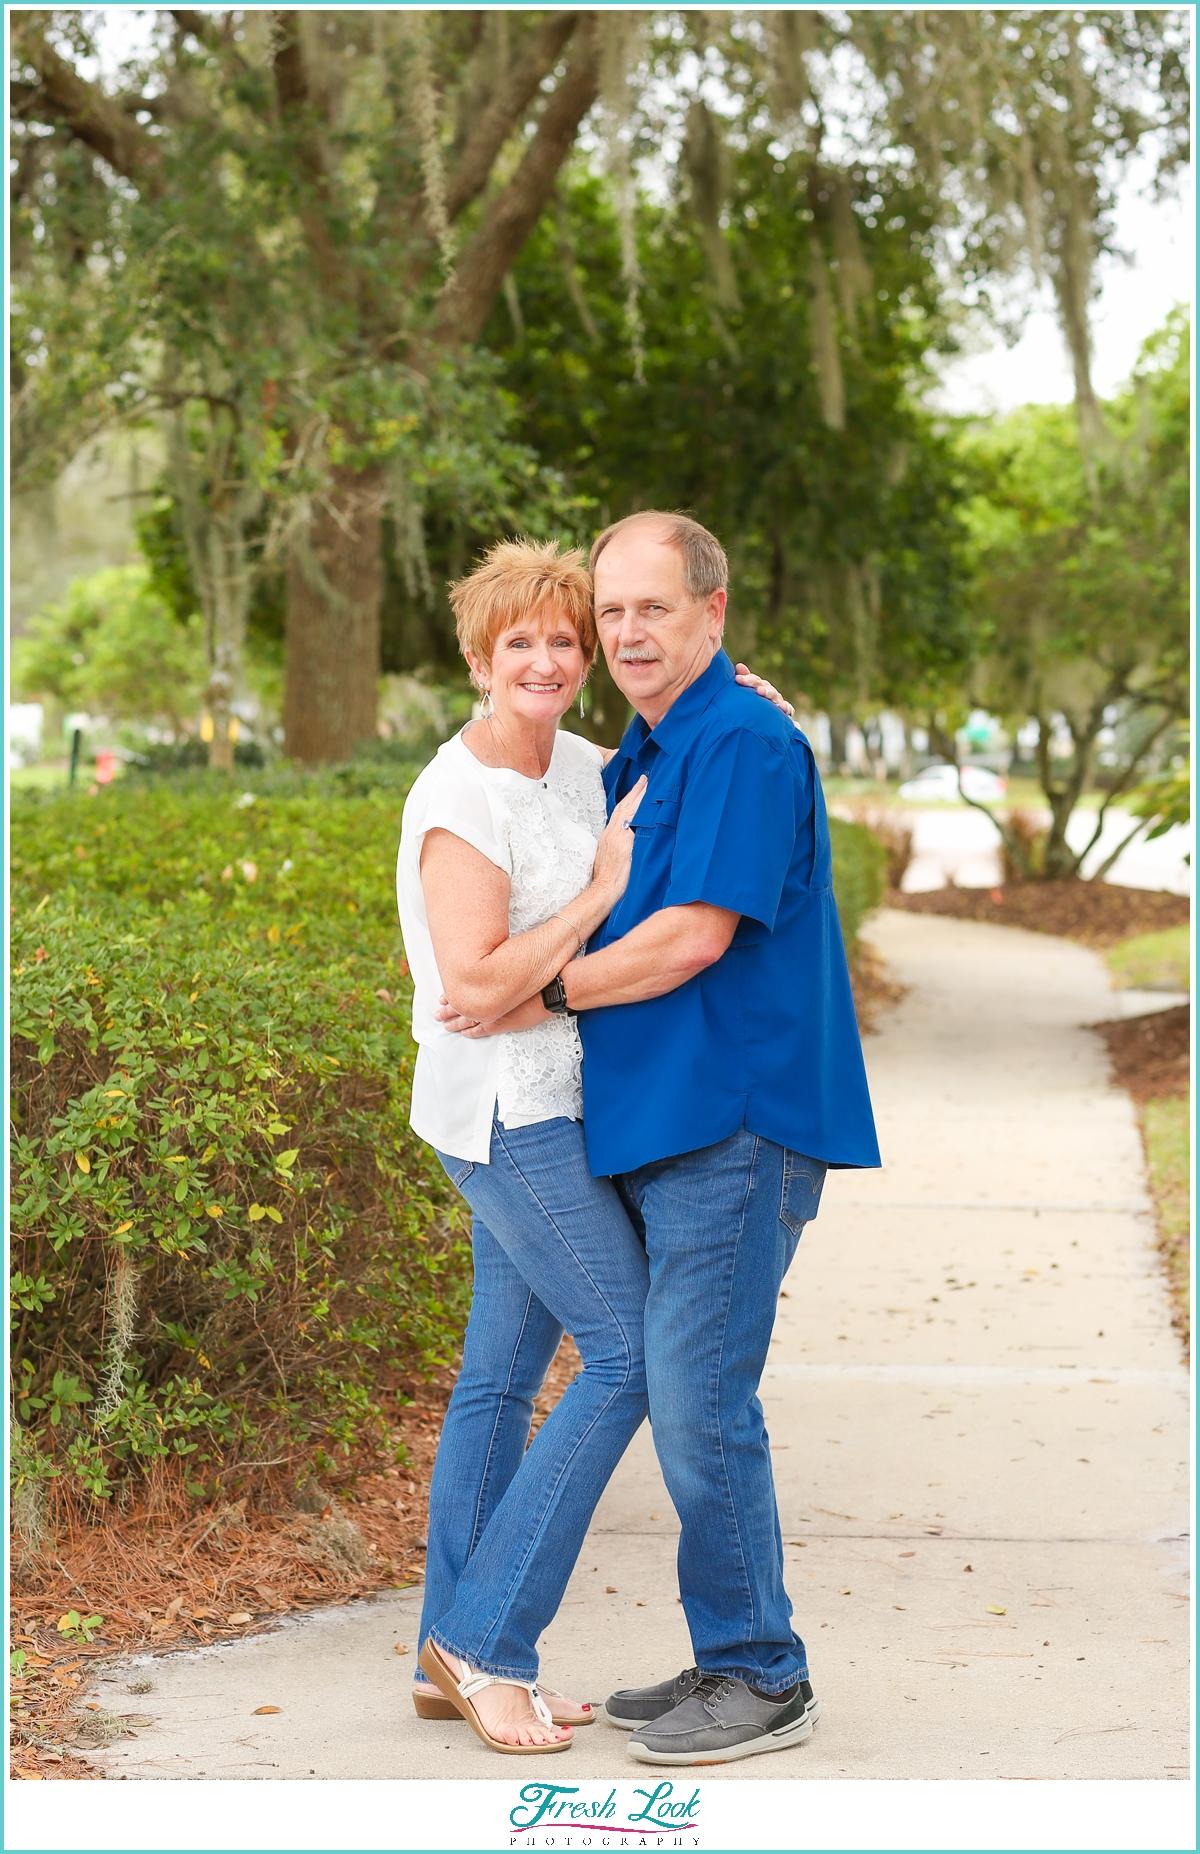 true love at any age